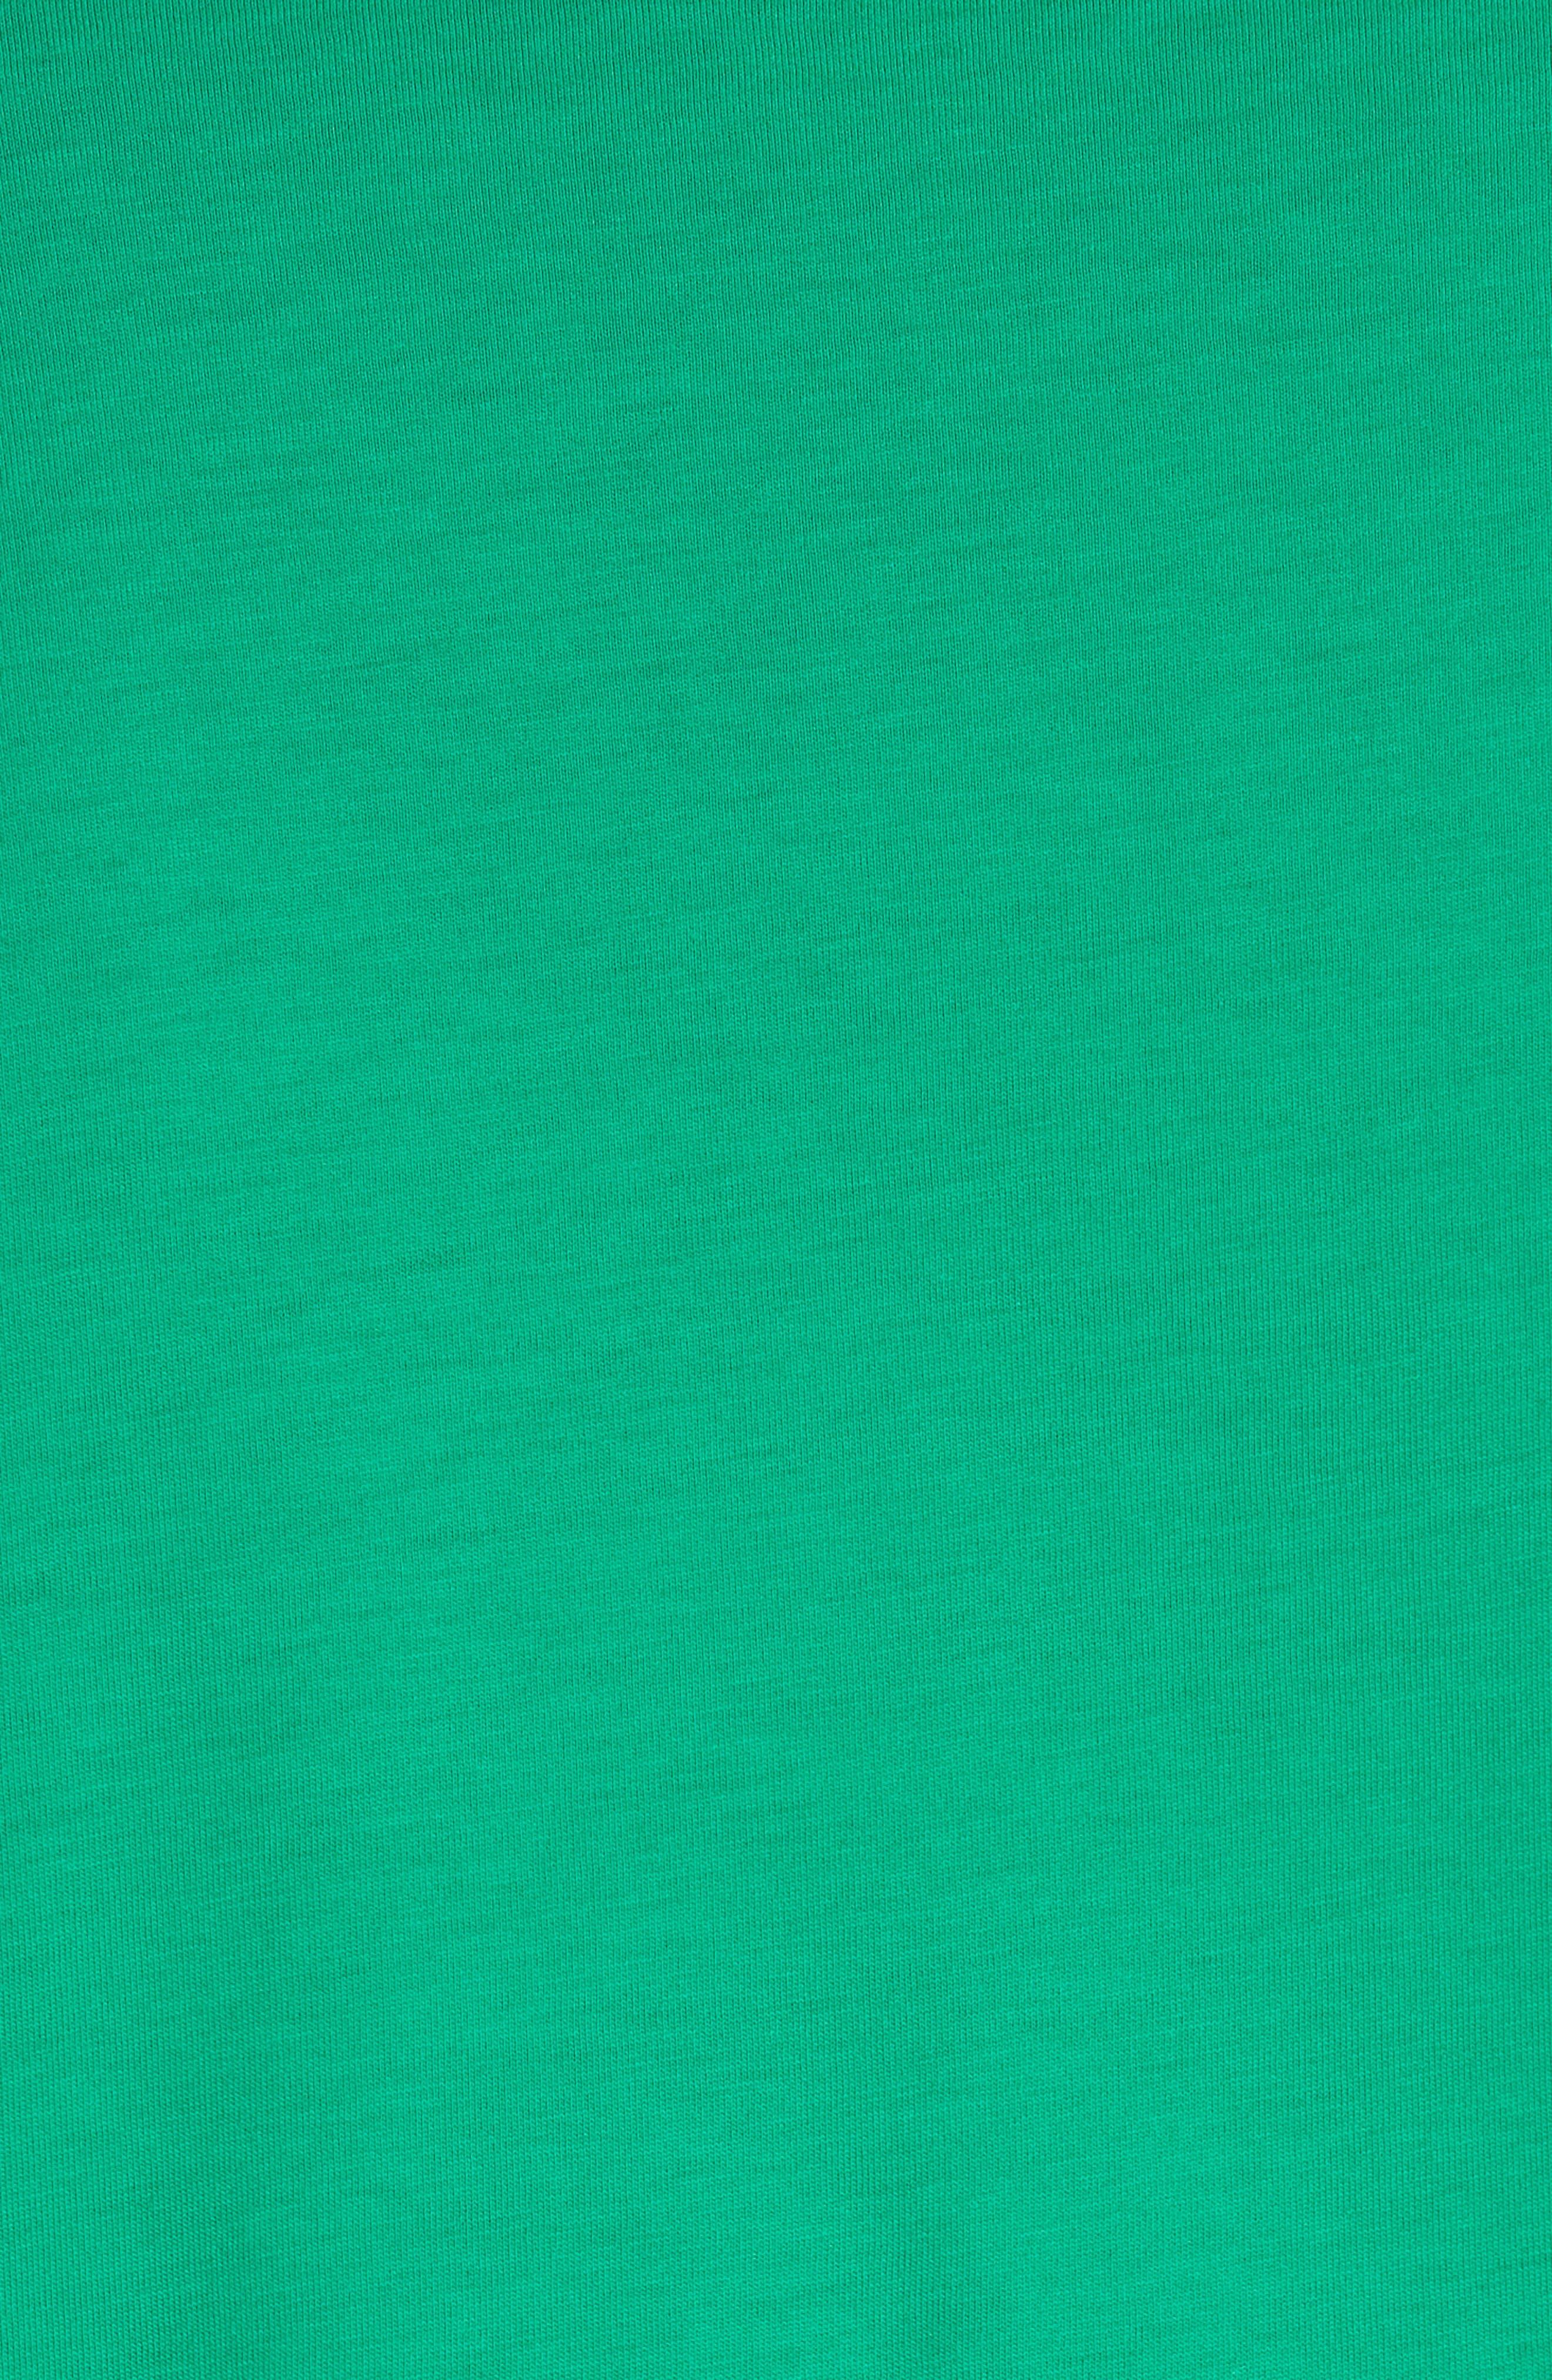 Jadford V-Neck T-Shirt,                             Alternate thumbnail 5, color,                             BRIGHT GREEN